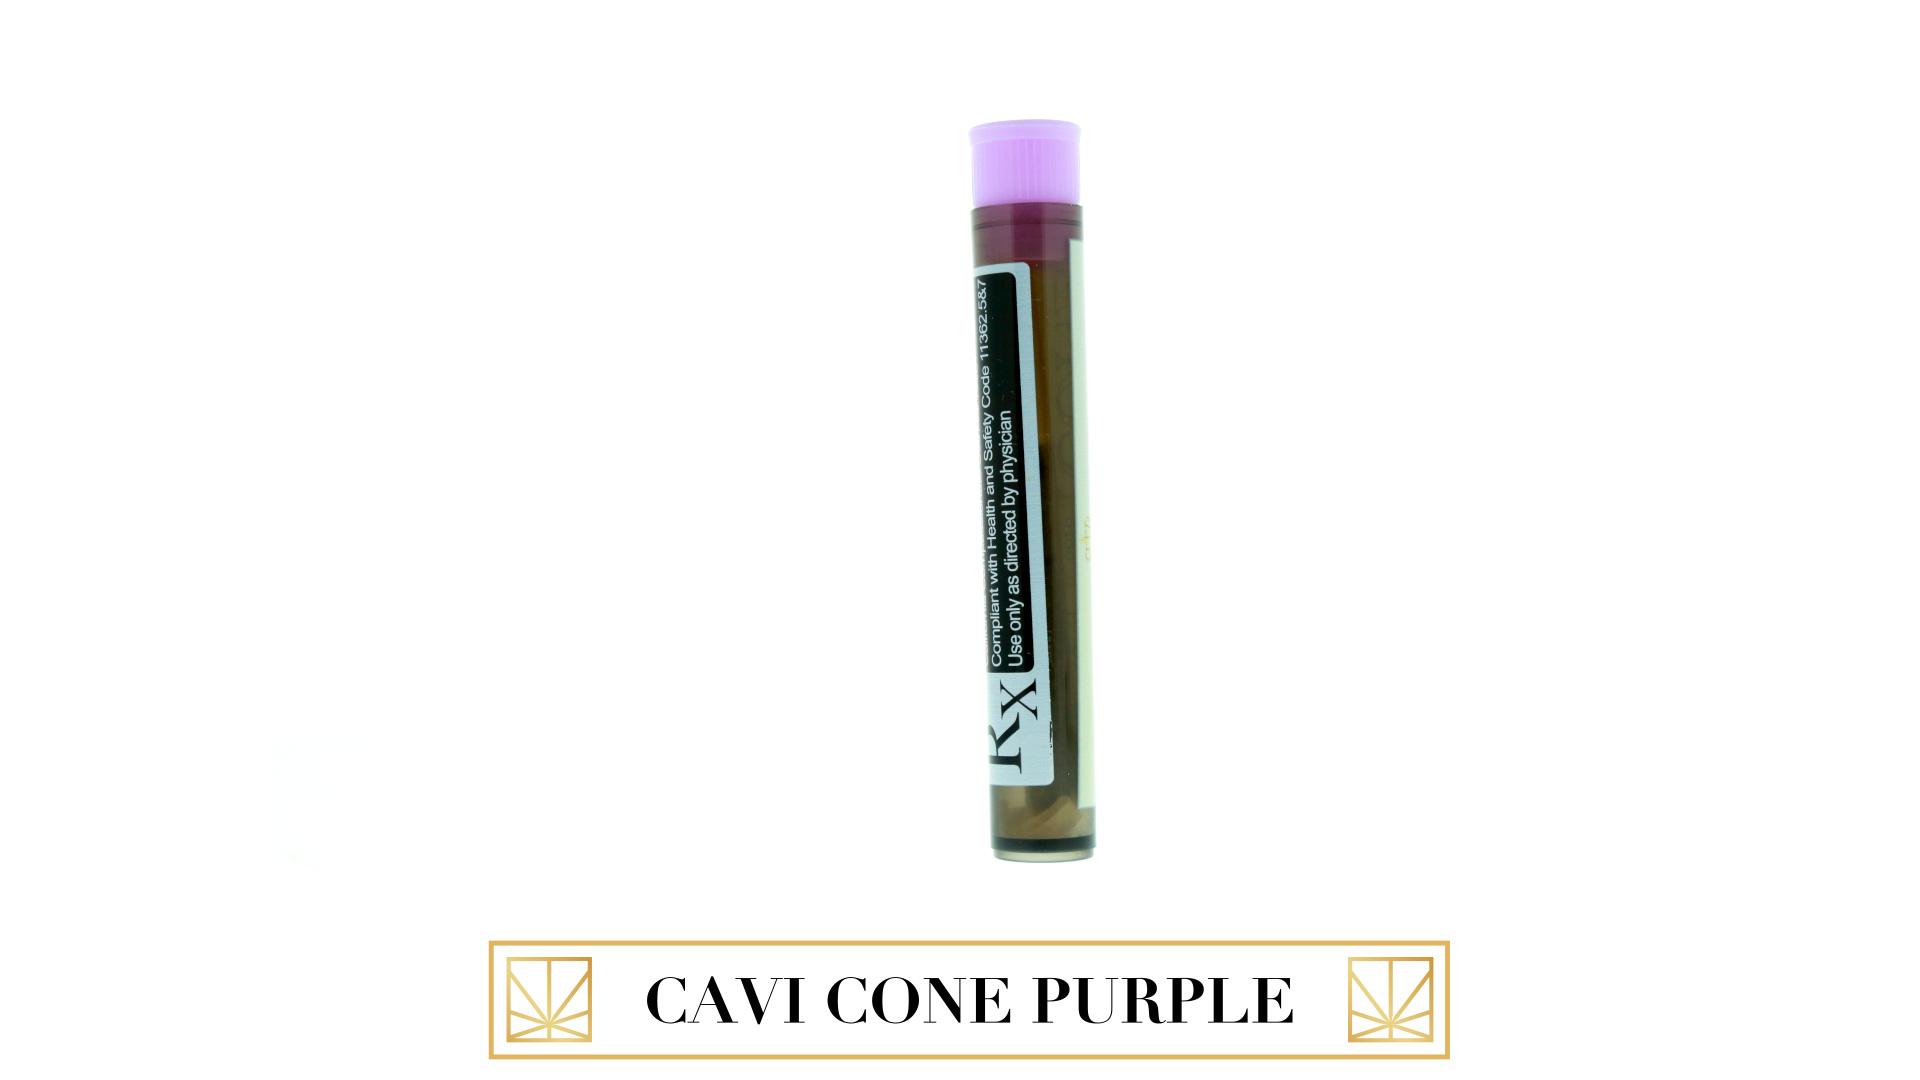 Caviar Gold Cavi Cone - Grape